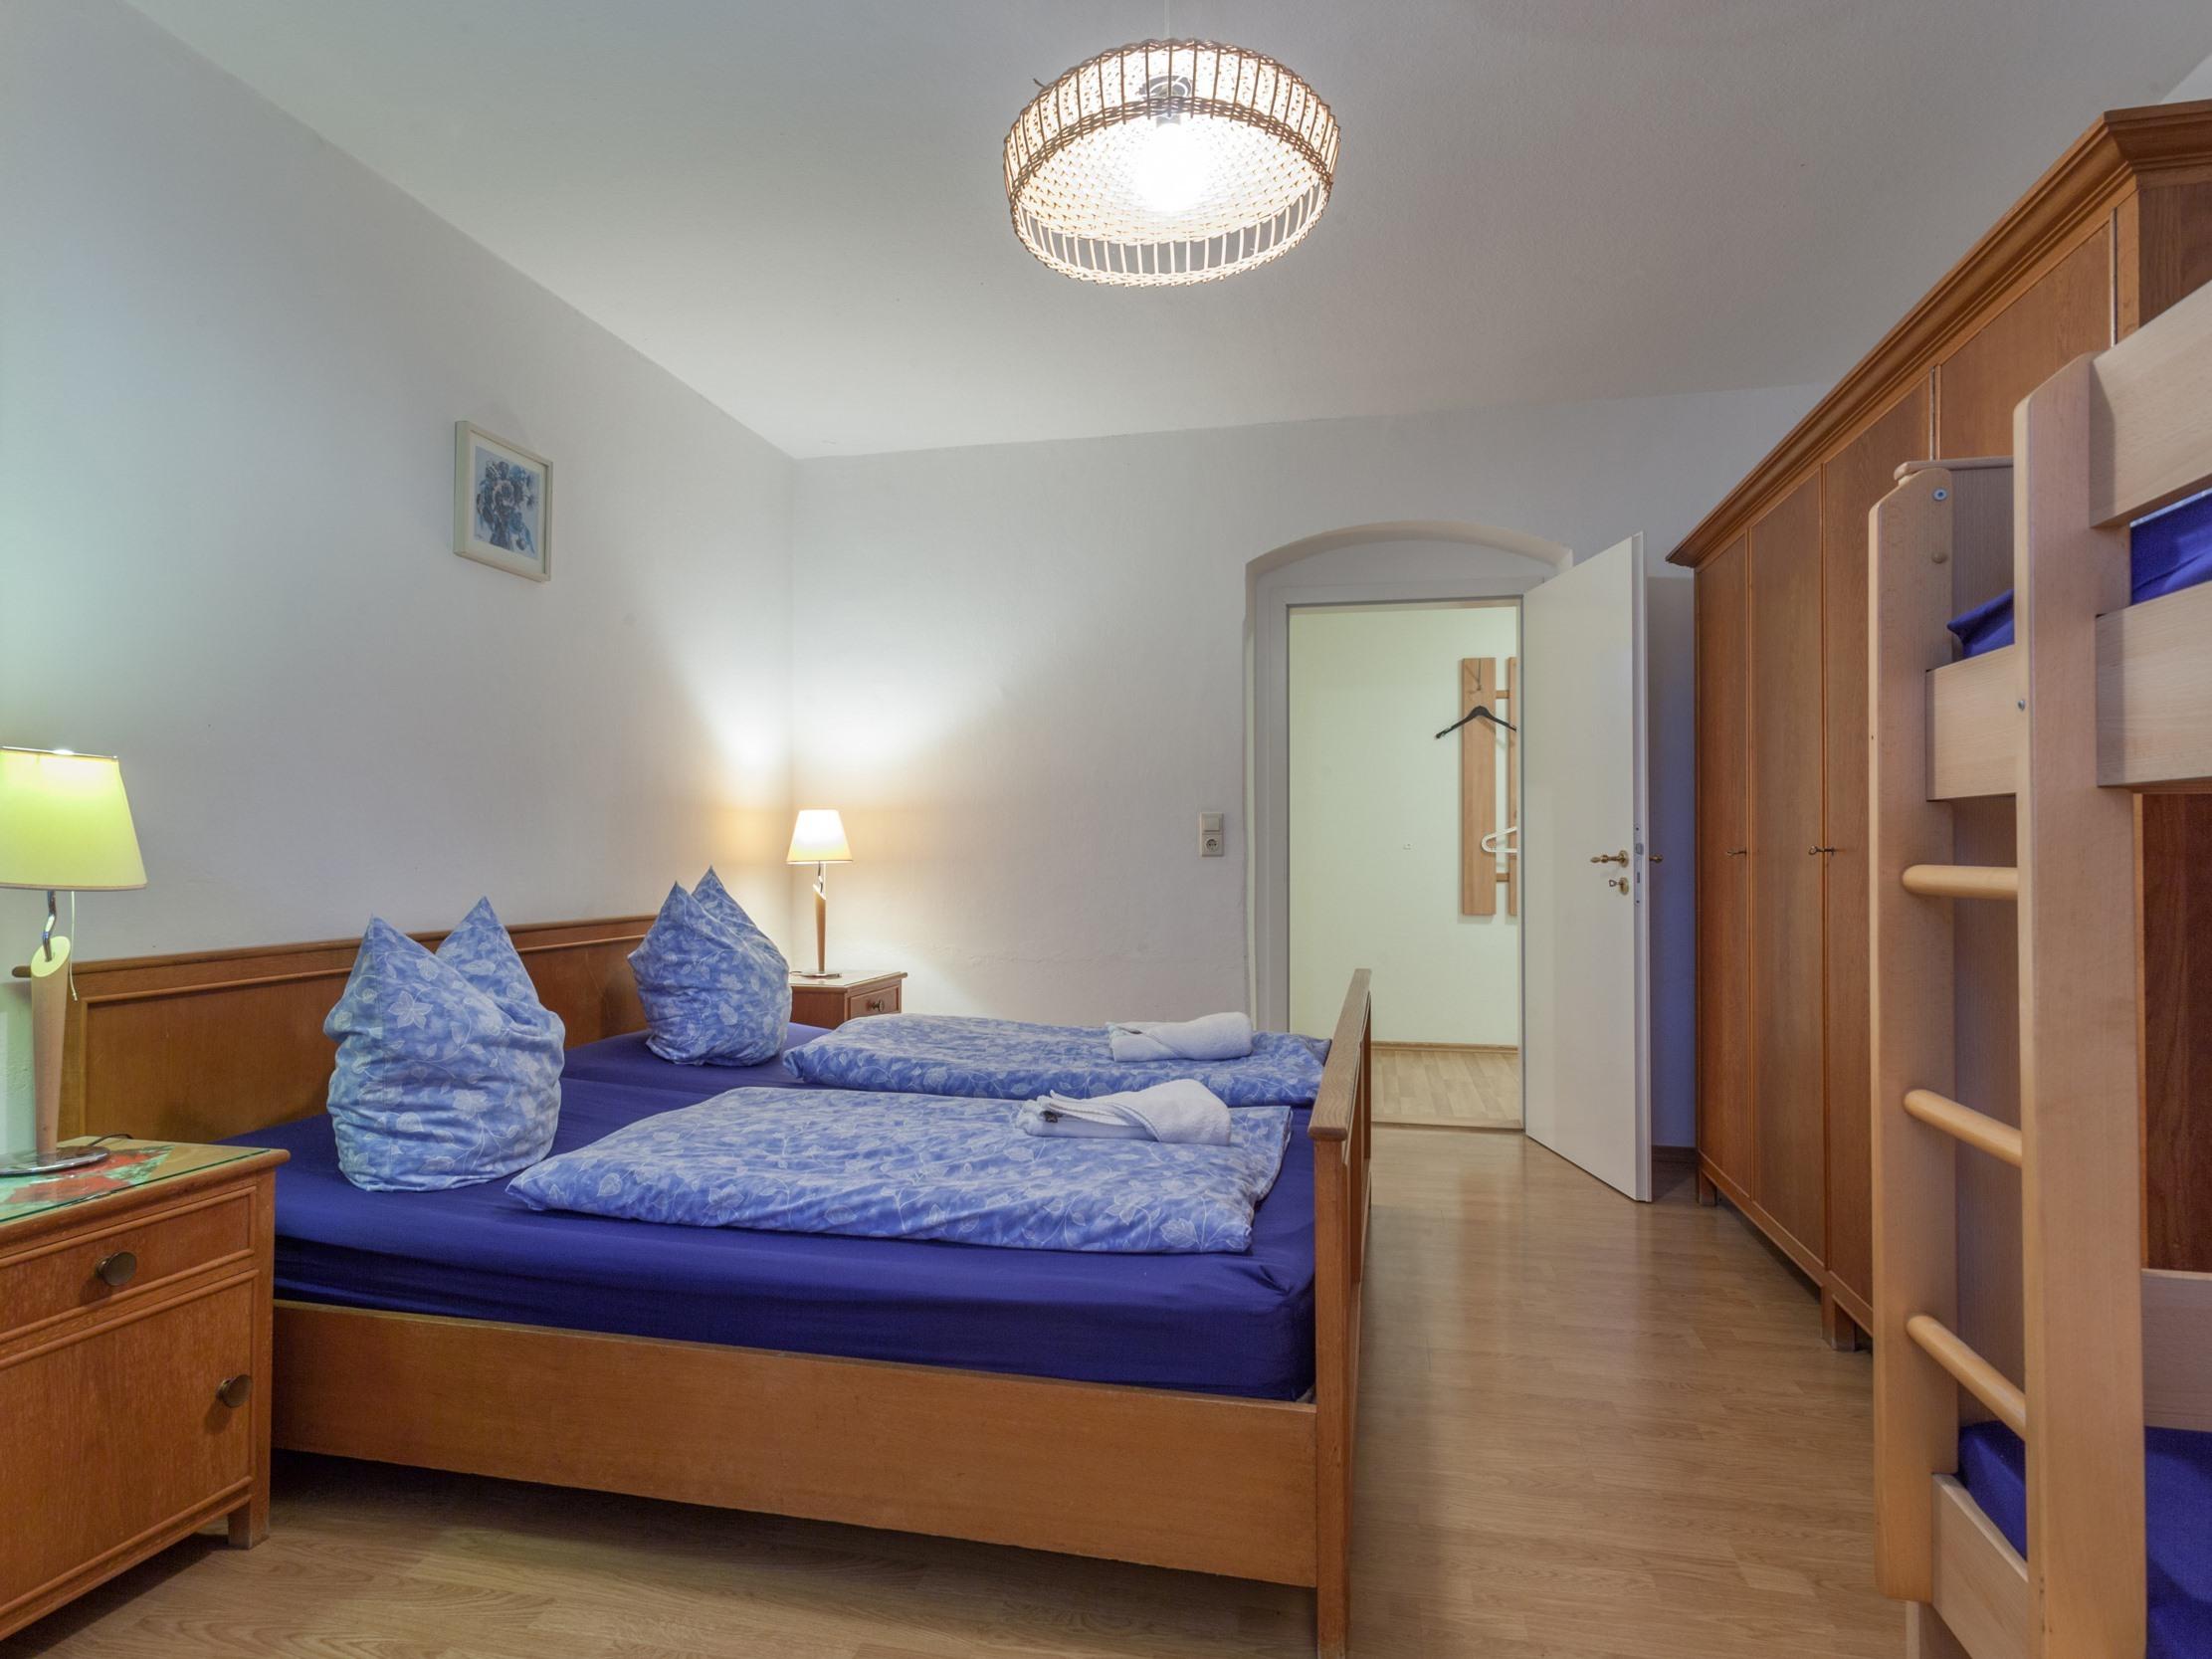 Apartment-Ensuite Bad-App. 5 - UG - Standardpreis